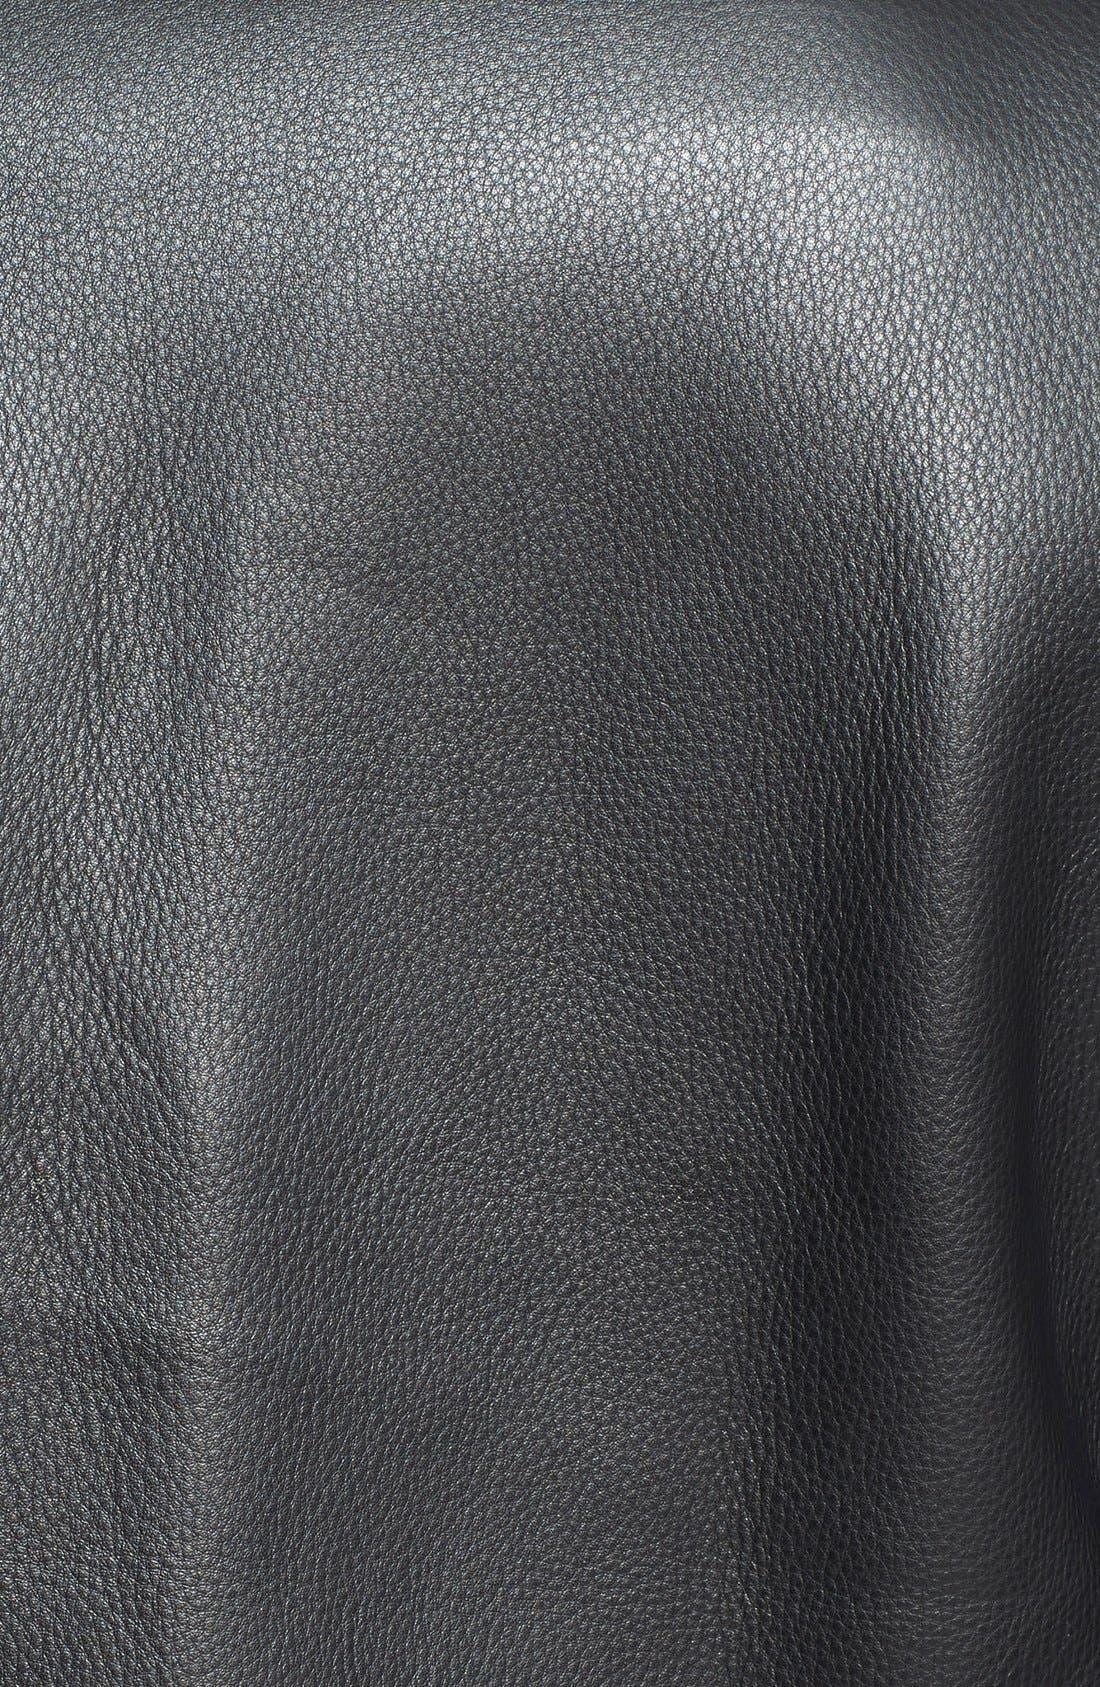 'Chips' Slim Fit Moto Leather Jacket,                             Alternate thumbnail 3, color,